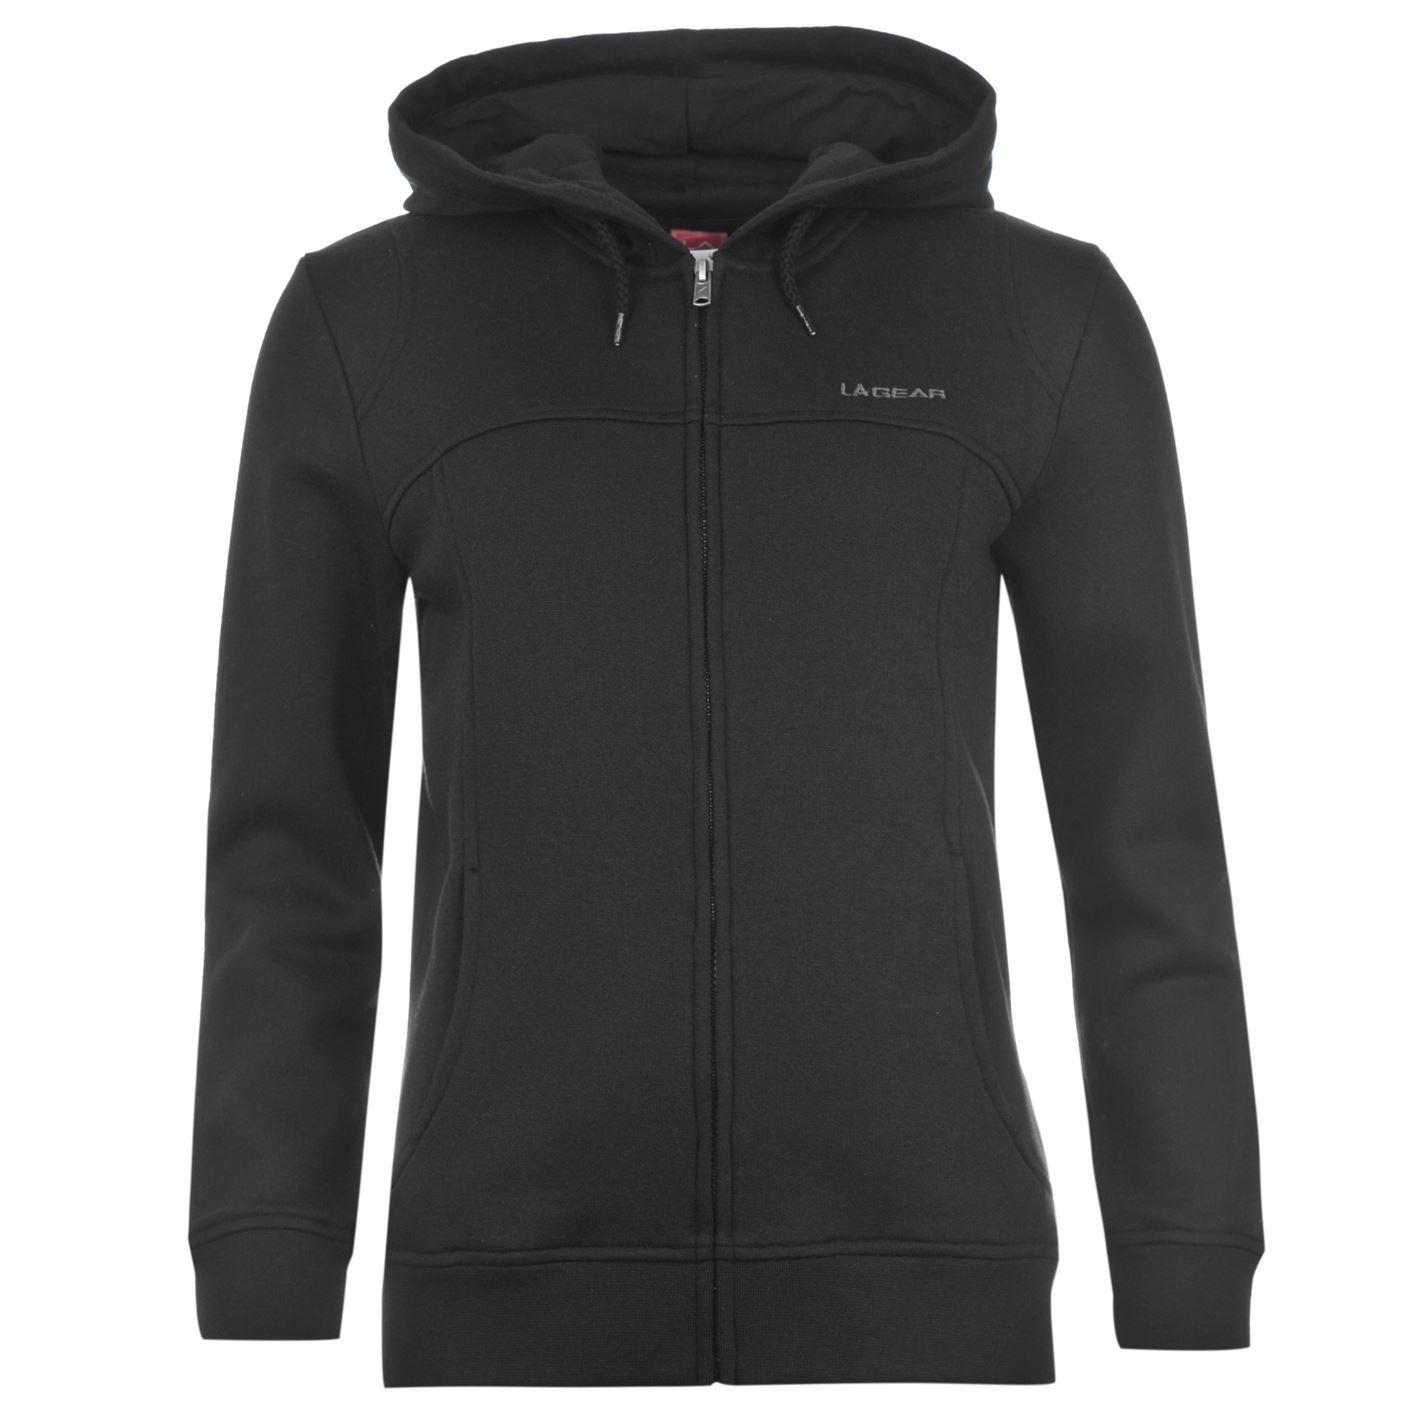 Sweat hoodies